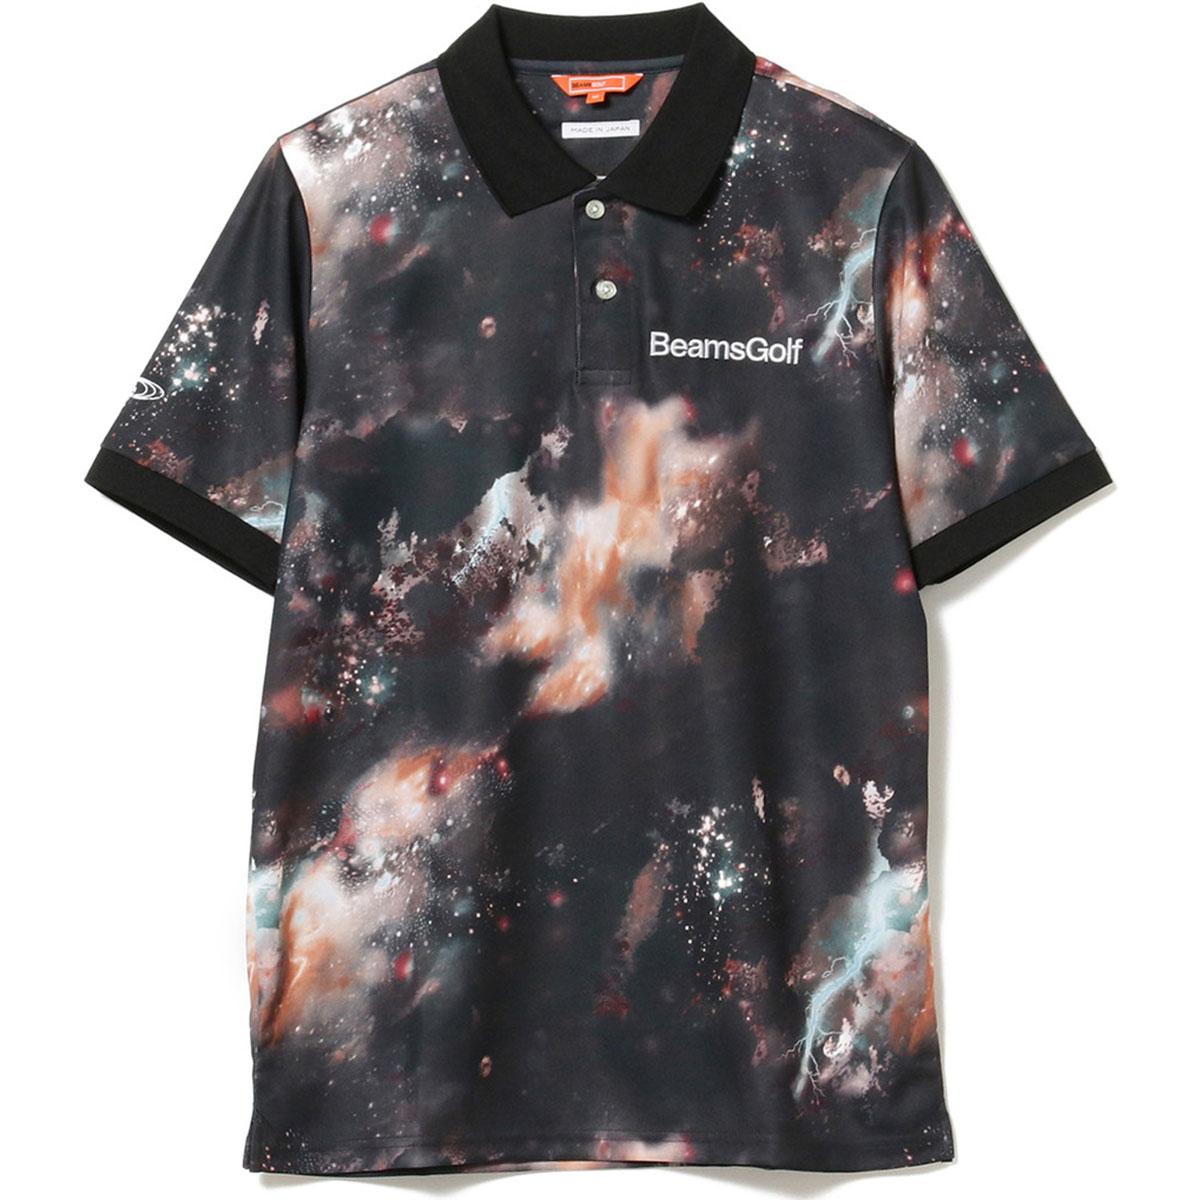 BEAMS GOLF ORANGE LABEL 宇宙柄 転写プリント ポロシャツ